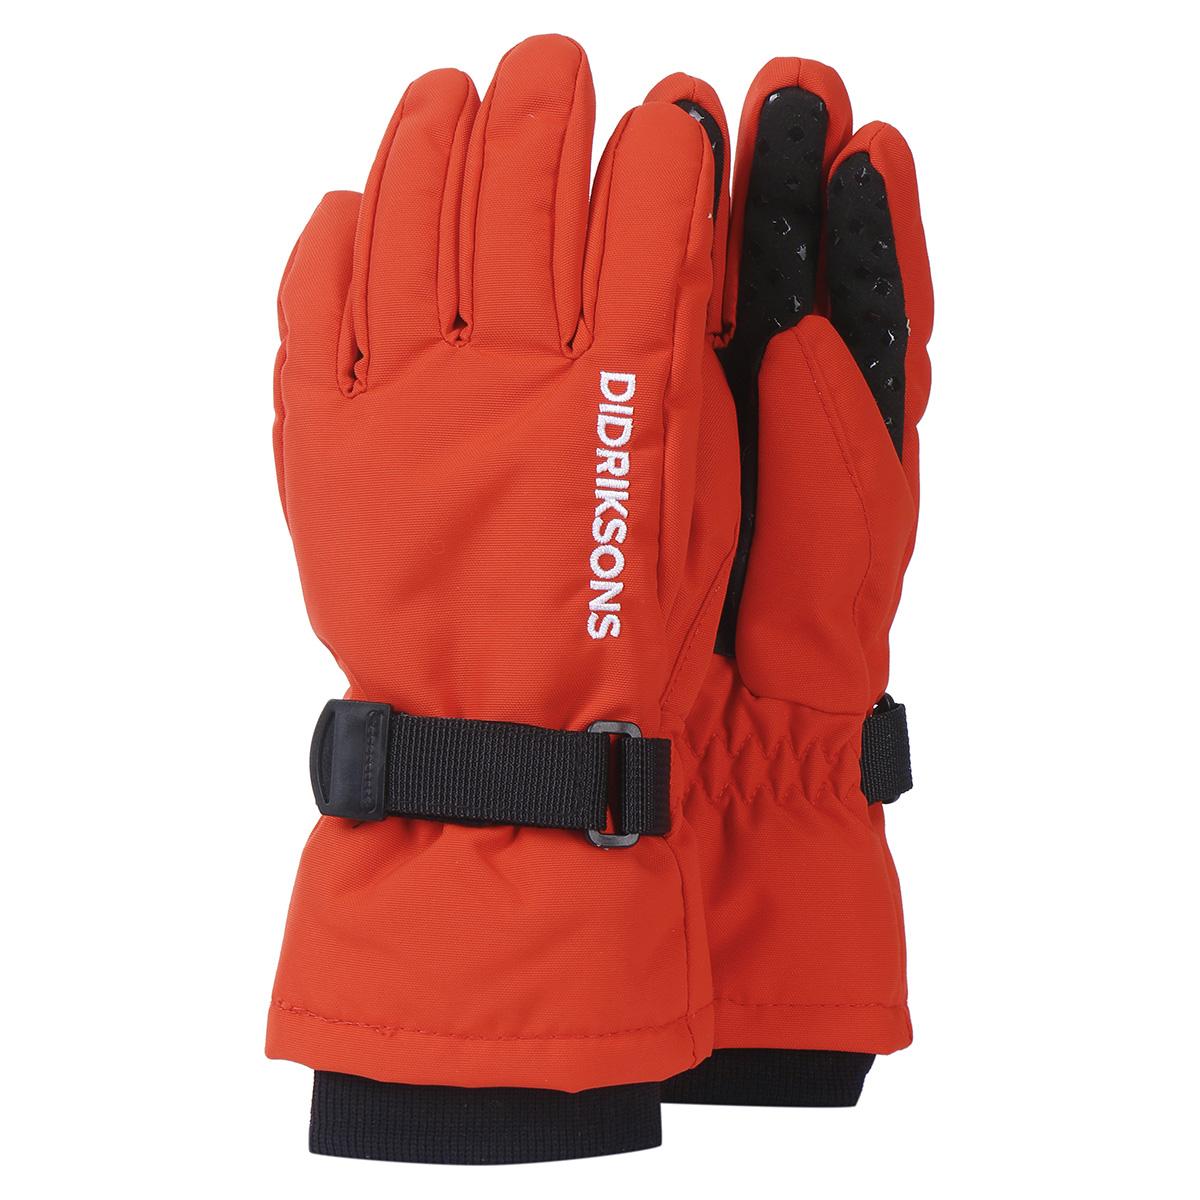 Перчатки BIGGLES FIVE Didriksons, Размер 8-10, Цвет 424-маково-оранжевый 503421-424_8-10